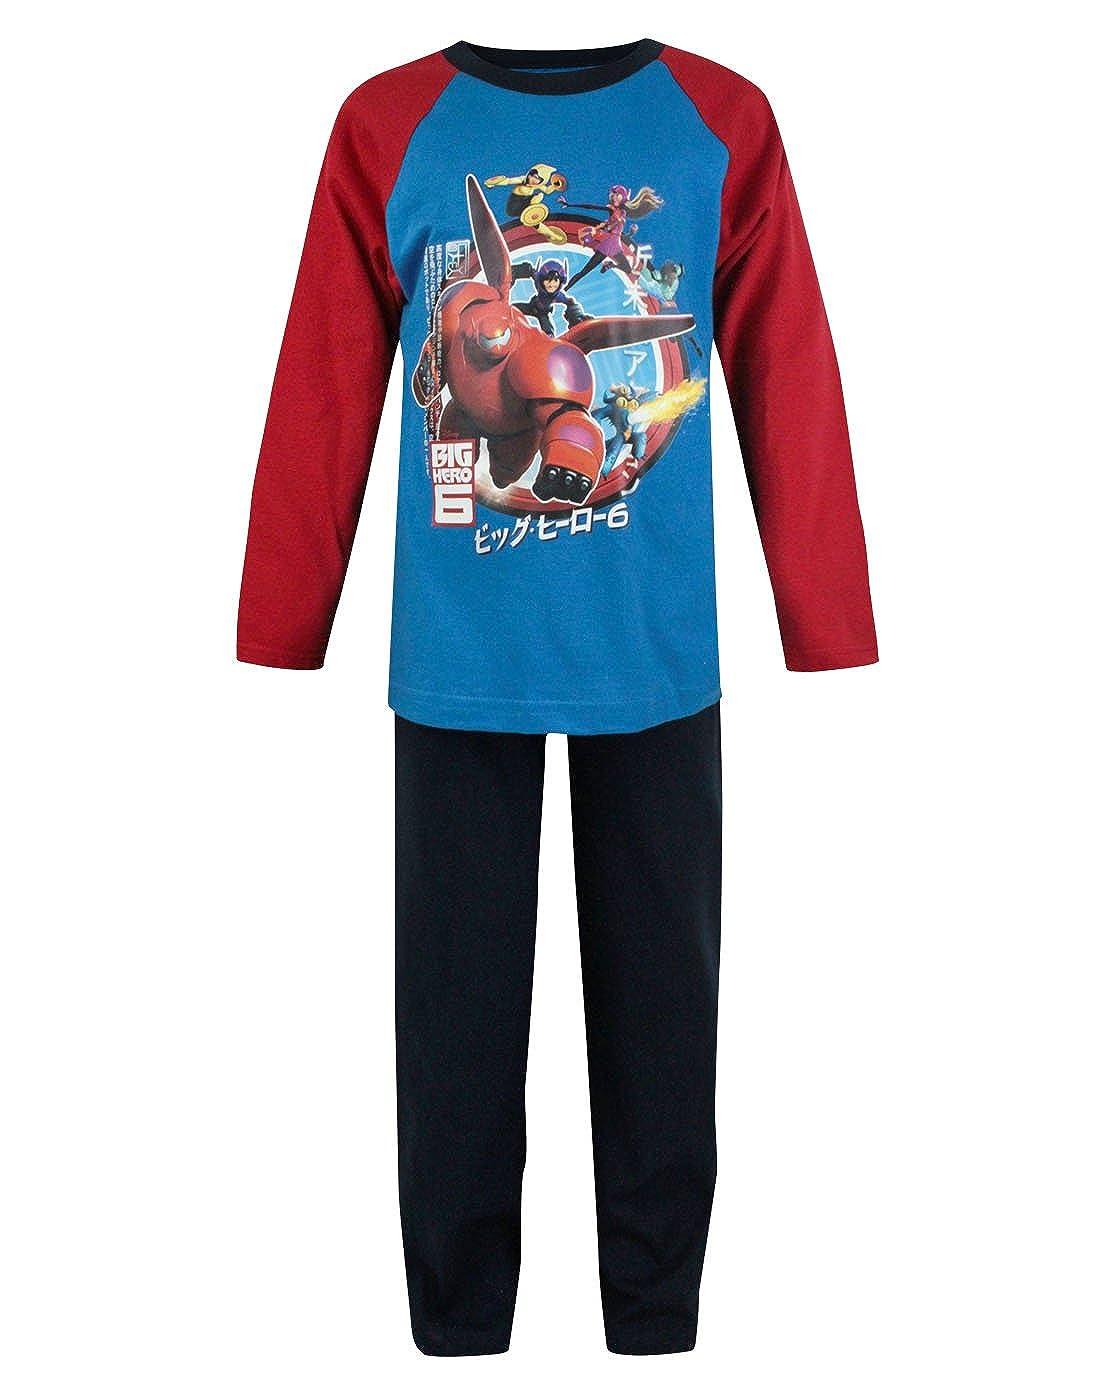 Official Big Hero 6 Boy's Pyjamas